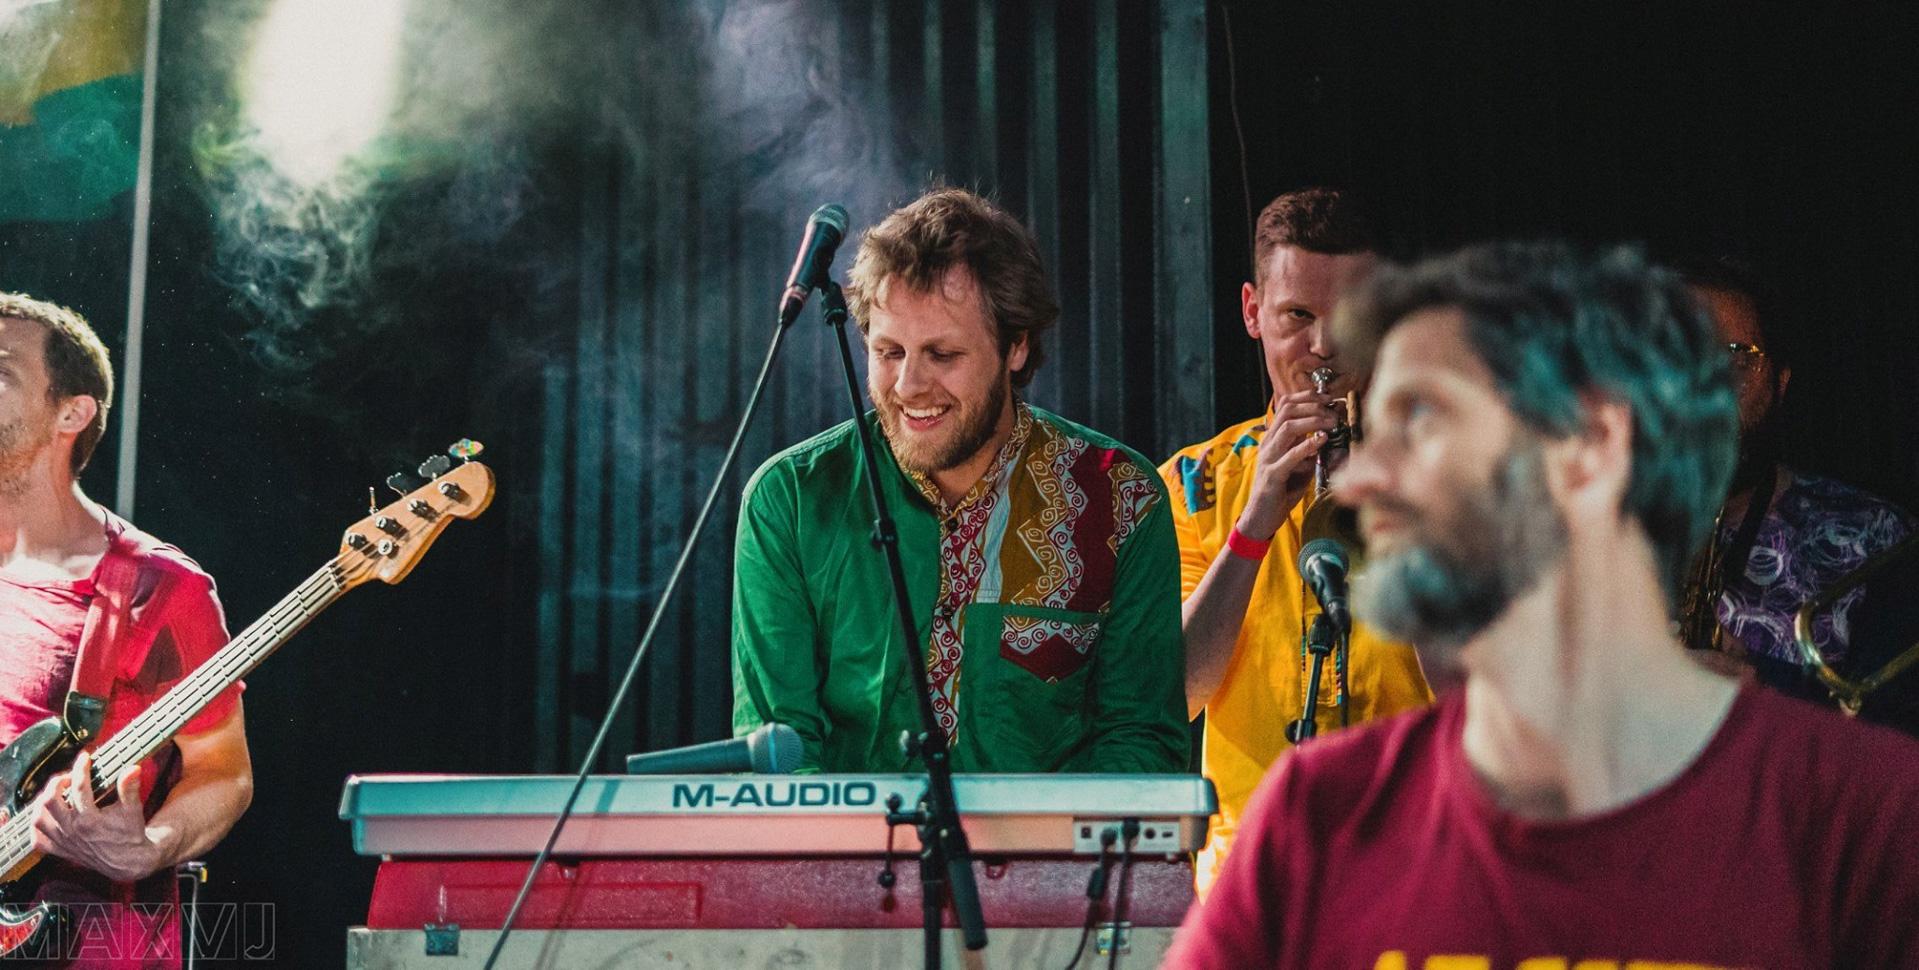 Aarhus Jazz Talent Pris 2019: Simon Eskildsen vinder åretspris